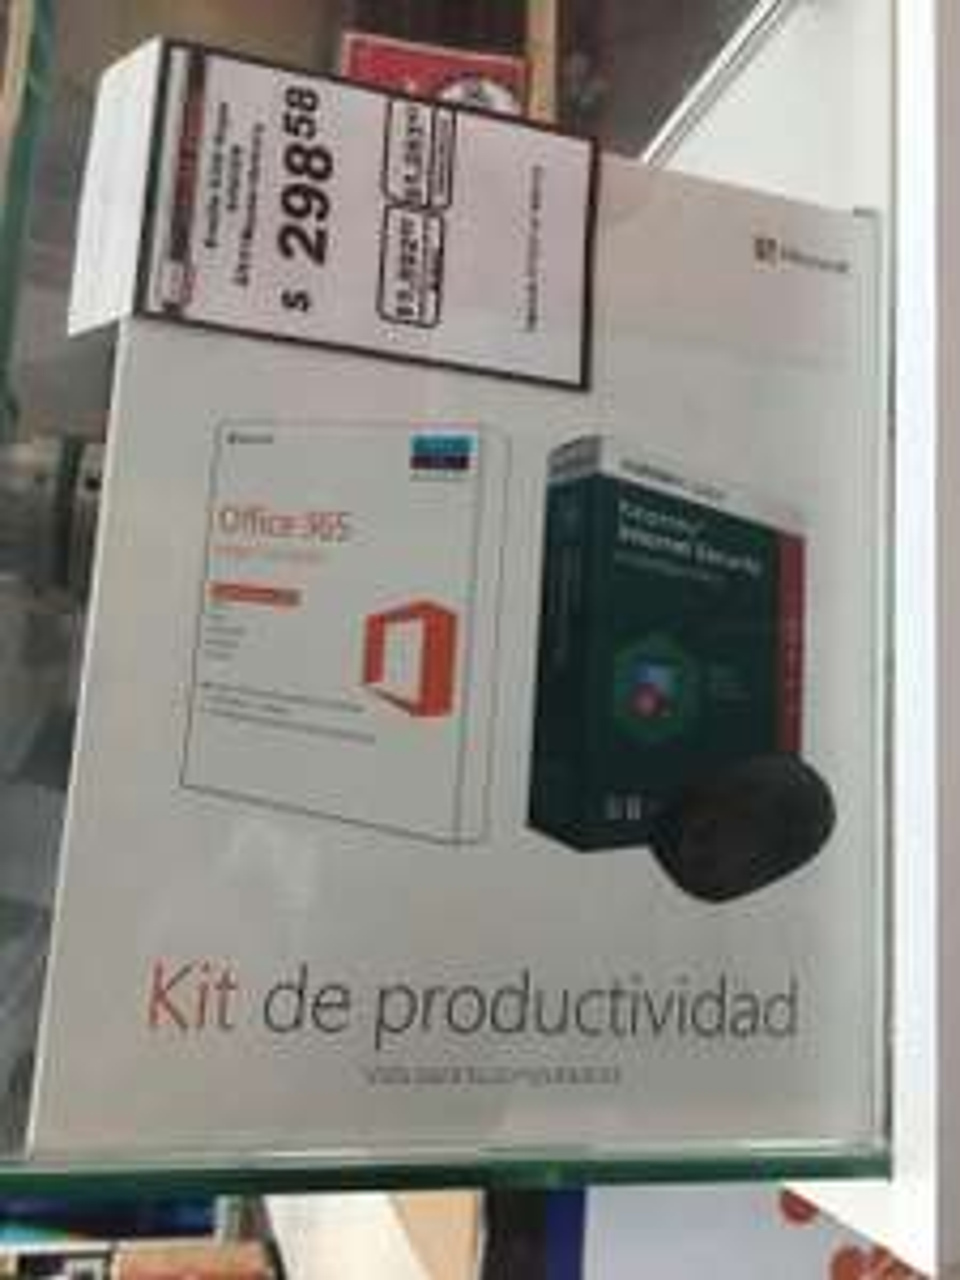 Office 365 Hogar + Antivirus + Mouse en Chedraui Selecto, Villahermosa, Tabasco.